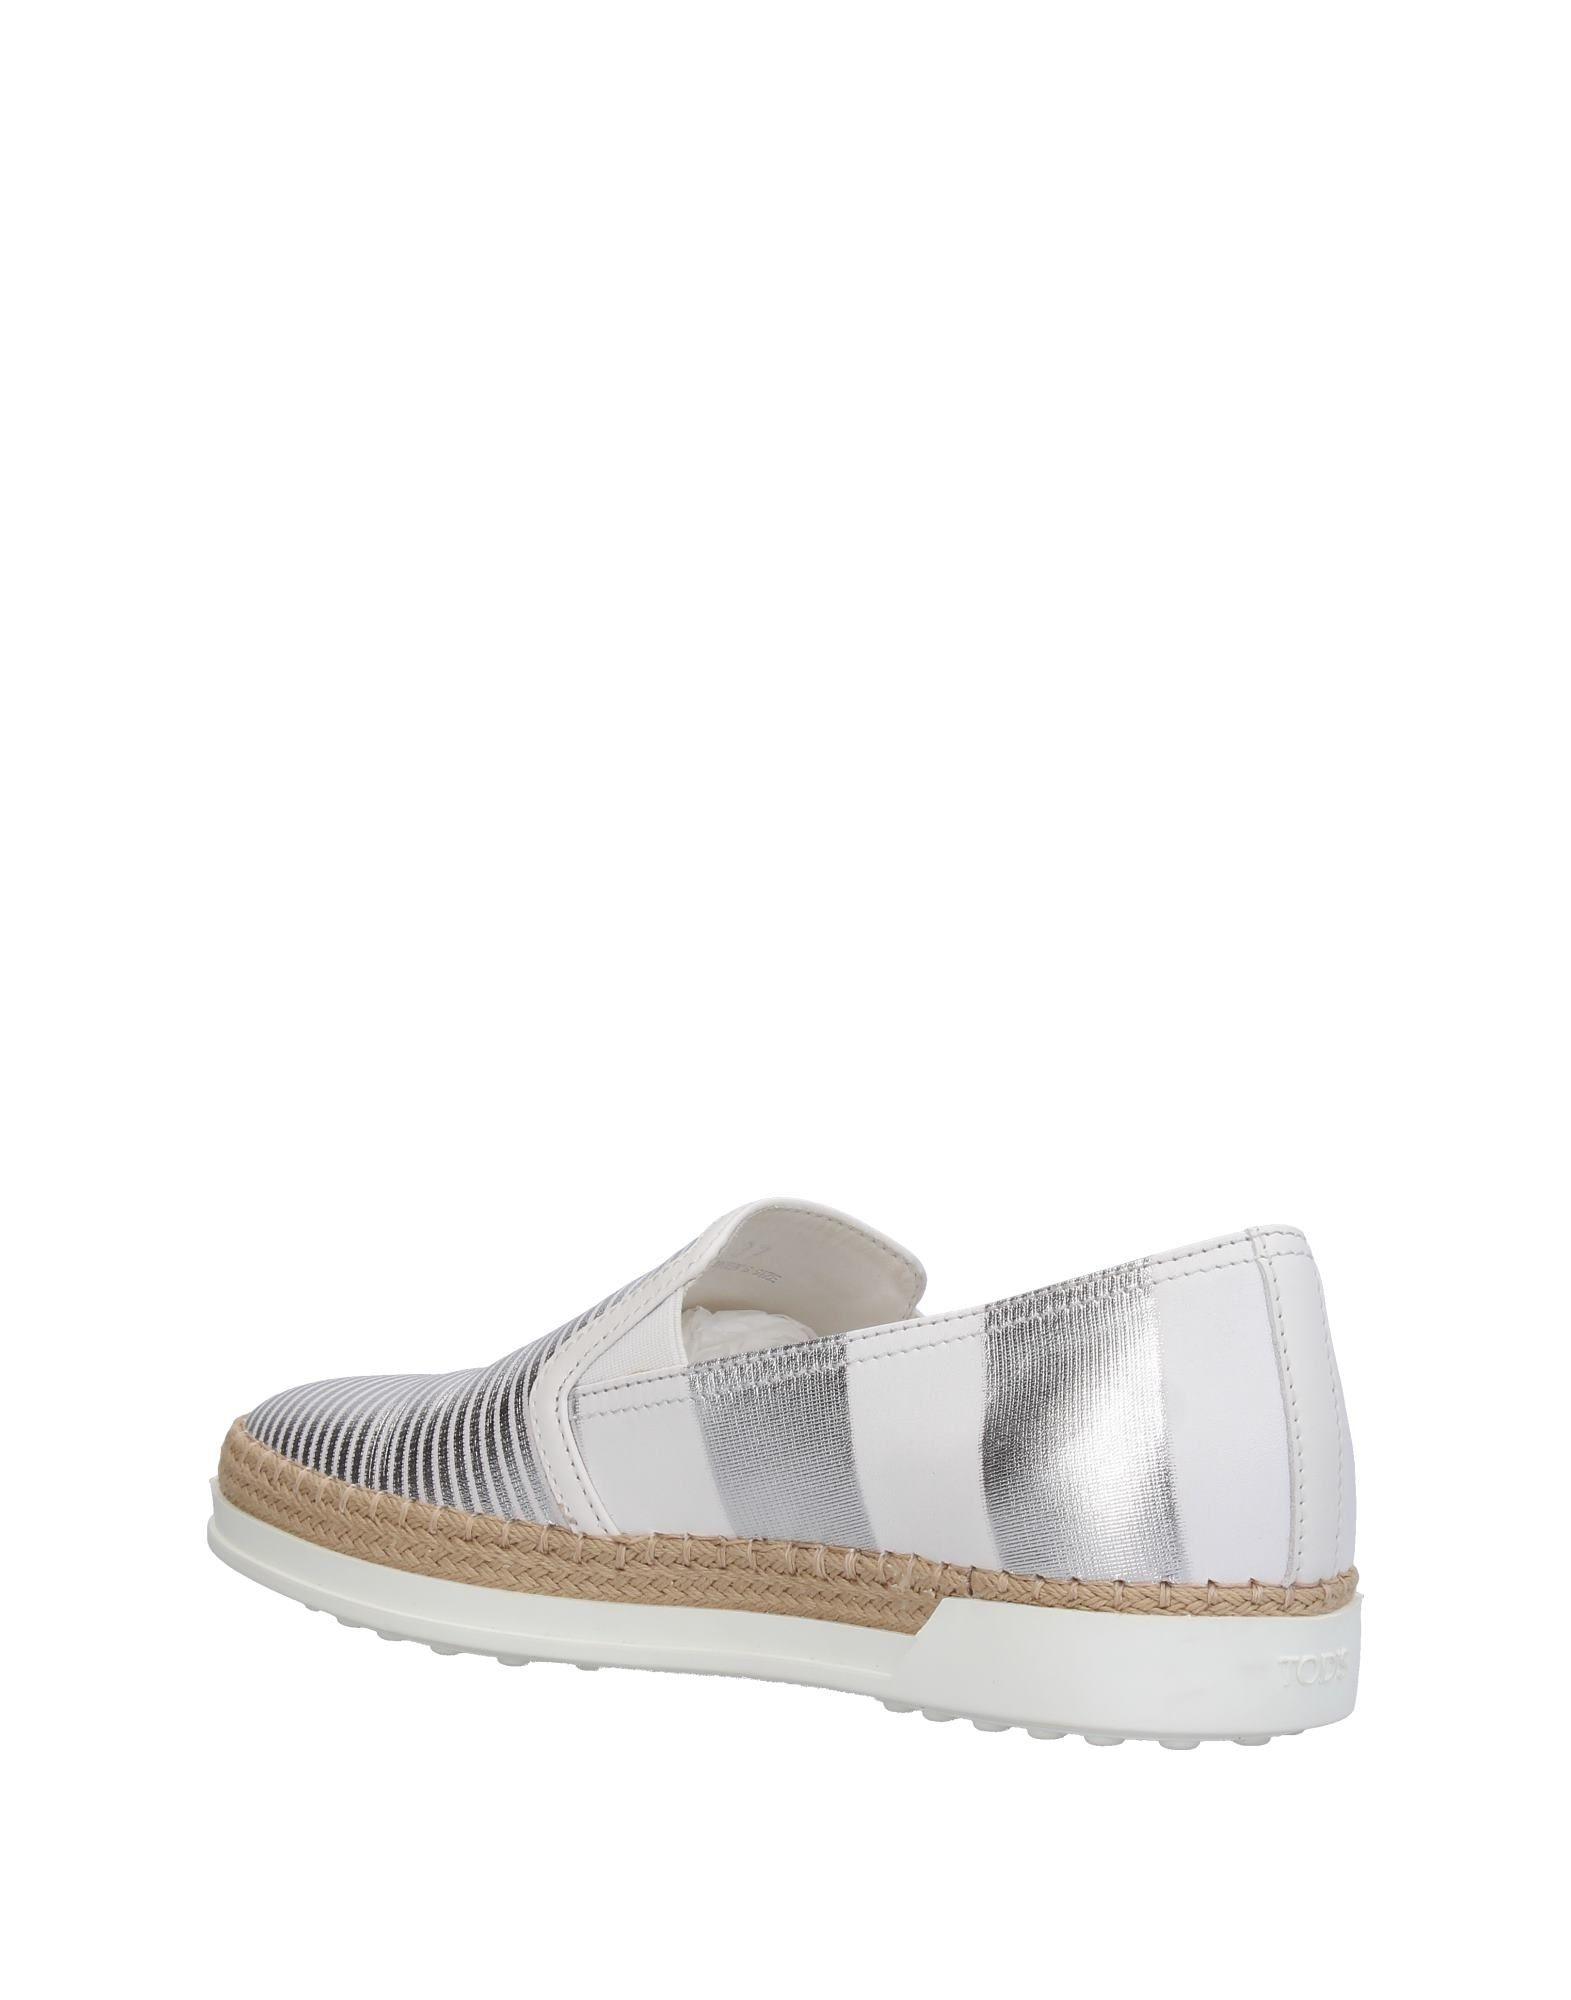 Tod's Sneakers Damen  strapazierfähige 11366724ABGut aussehende strapazierfähige  Schuhe f58ebe